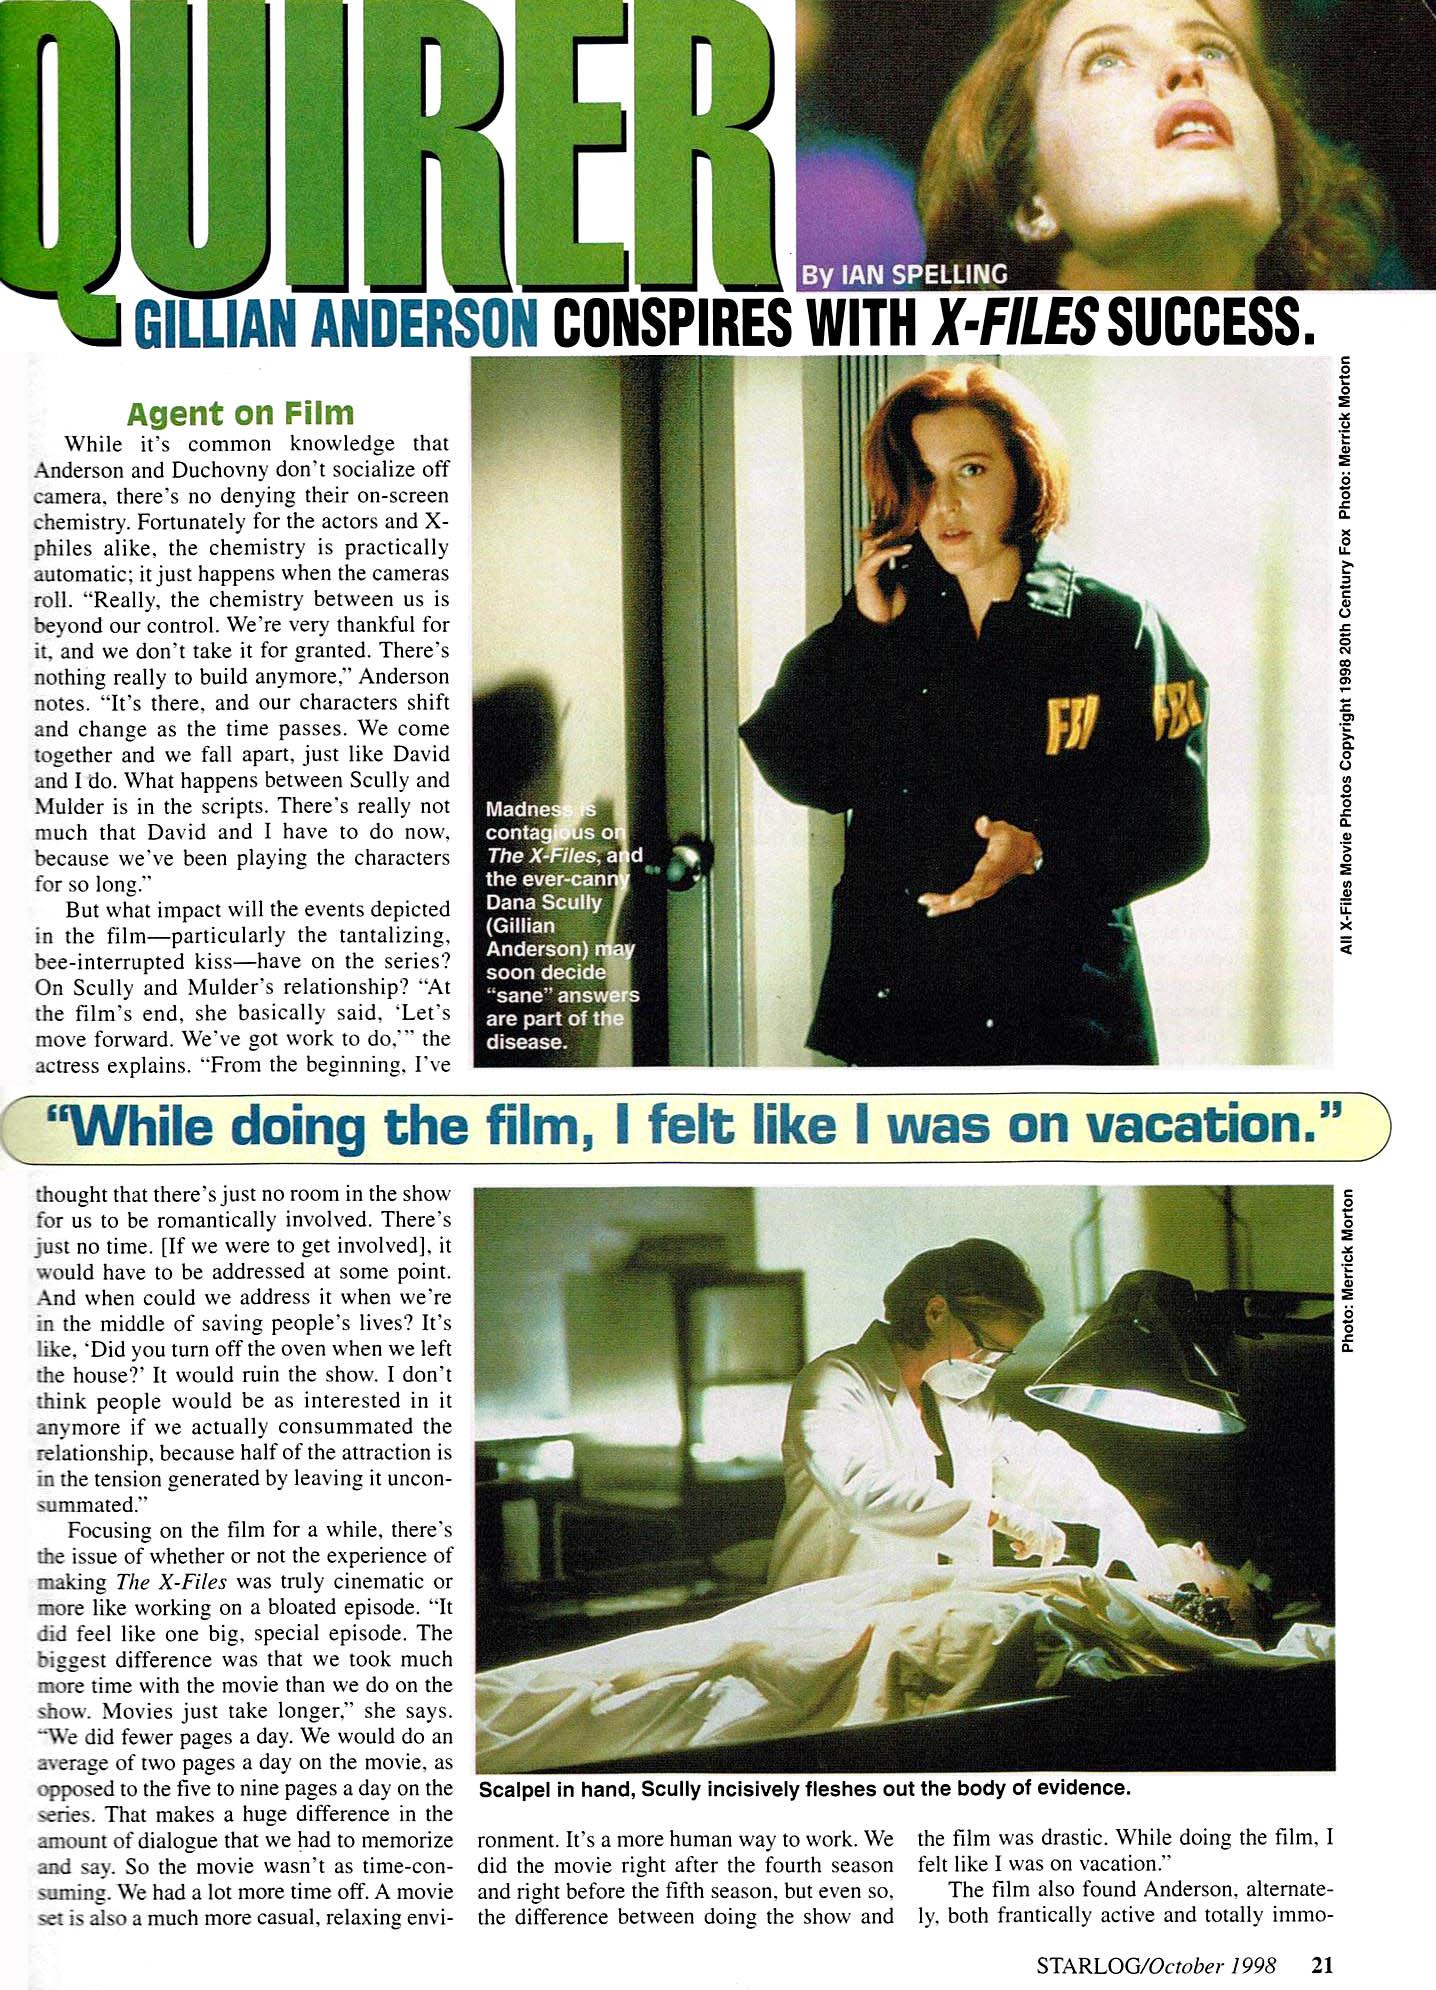 Starlog 255 1998 10 X-Files-2.jpg